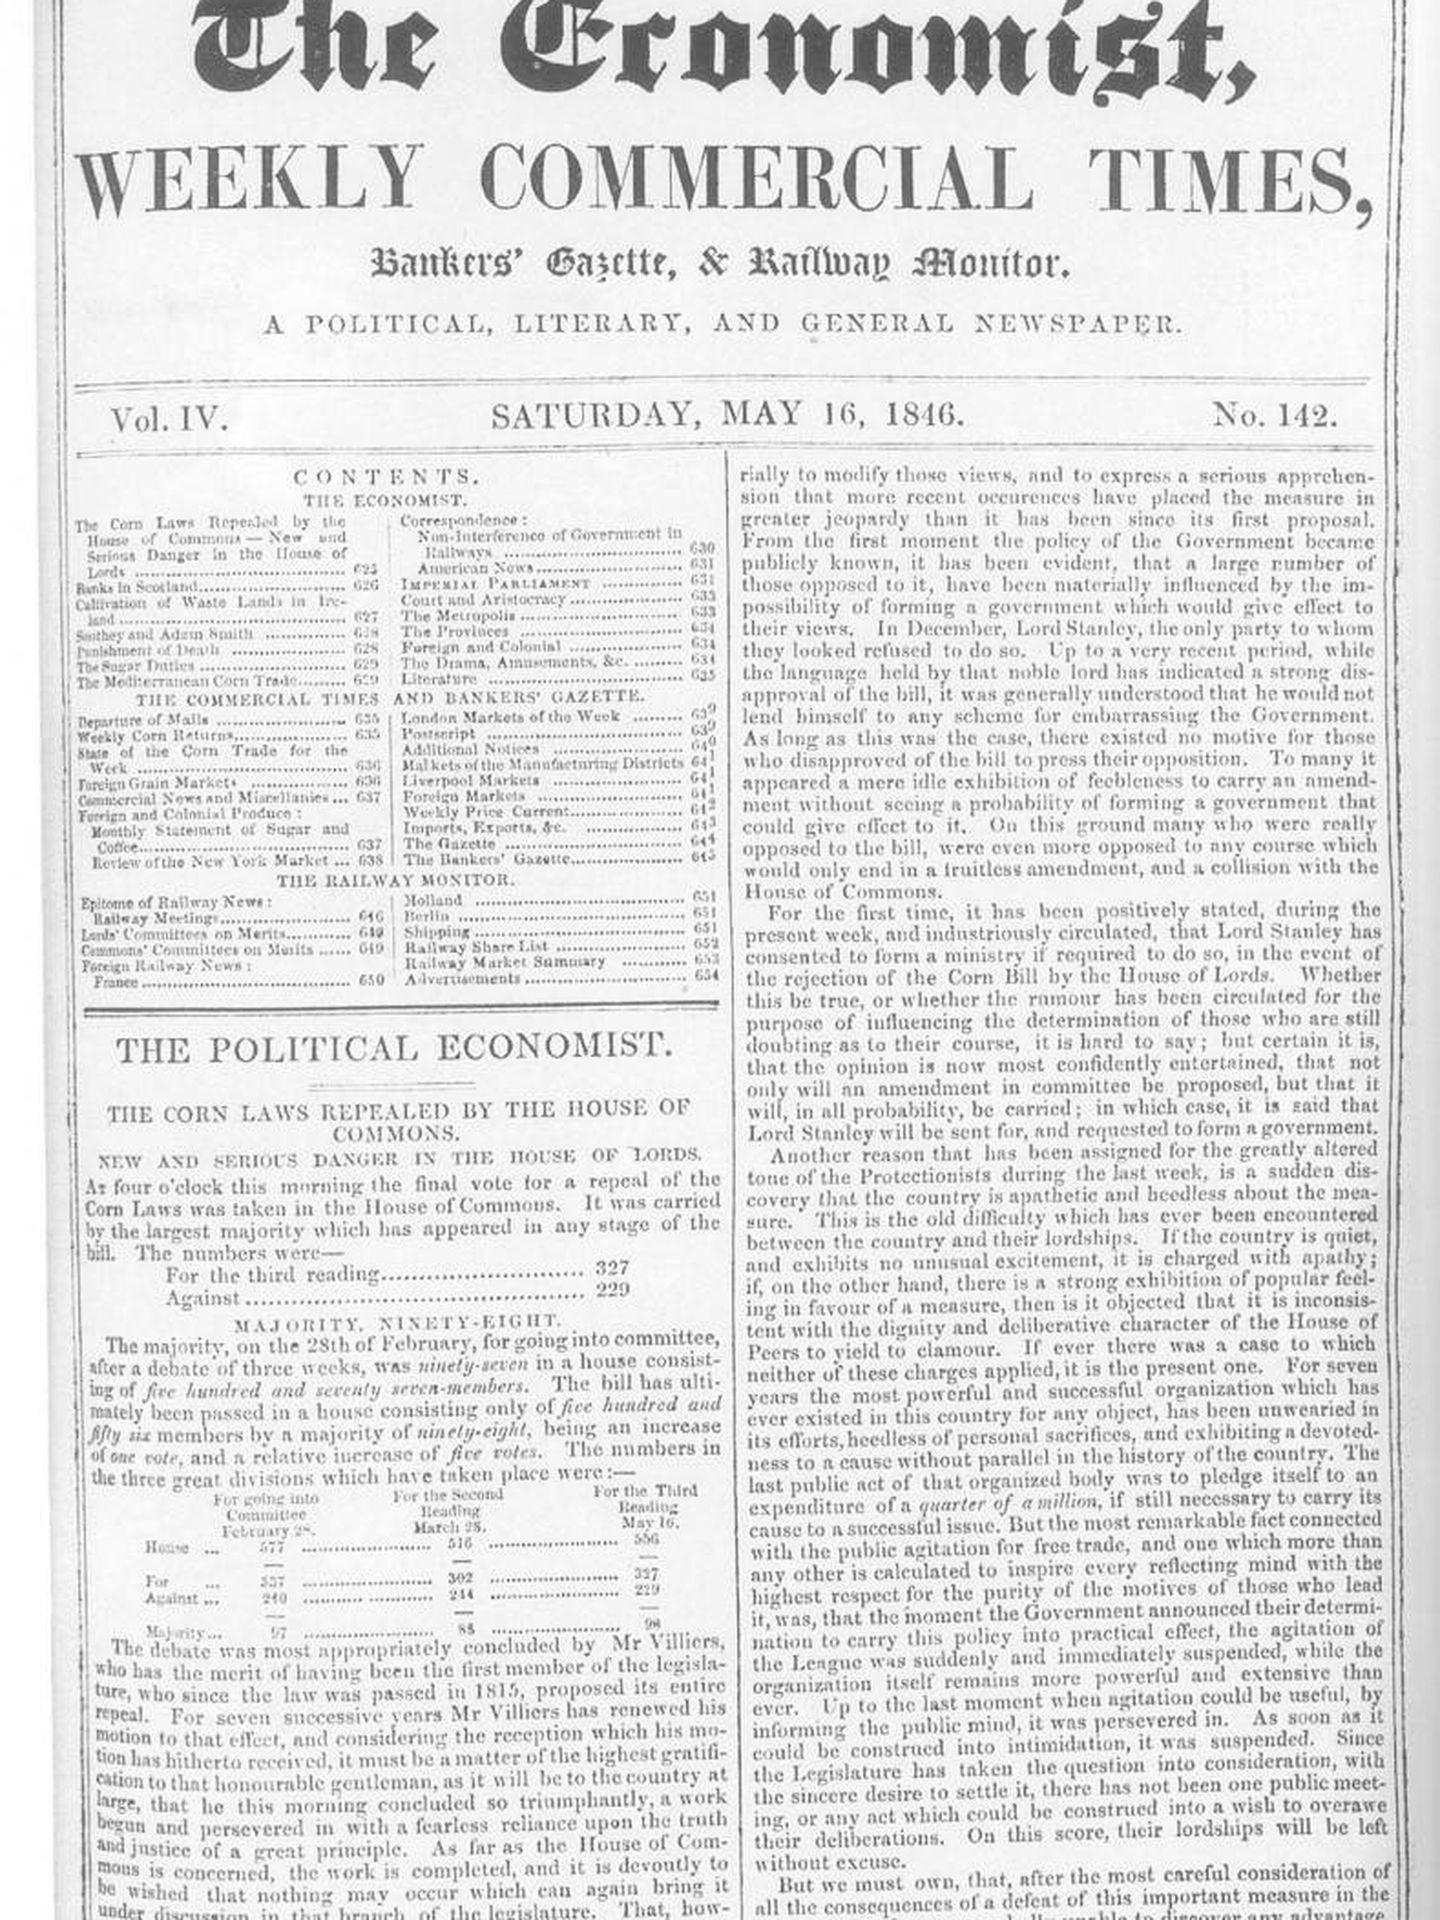 Ejemplar de 'The Economist' de 1846.